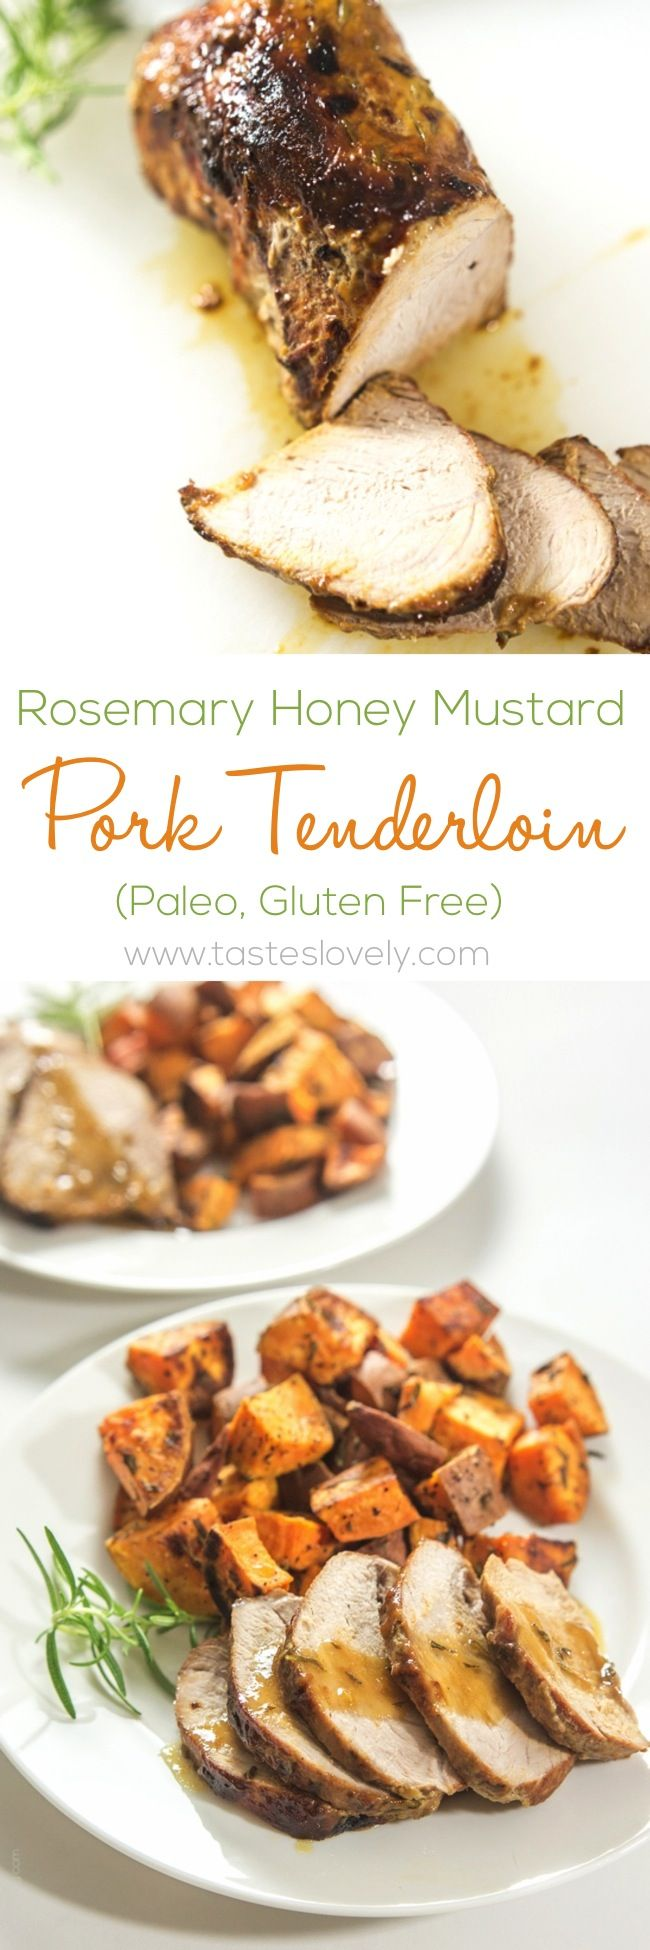 Rosemary Honey Mustard Pork Tenderloin #paleo #glutenfree